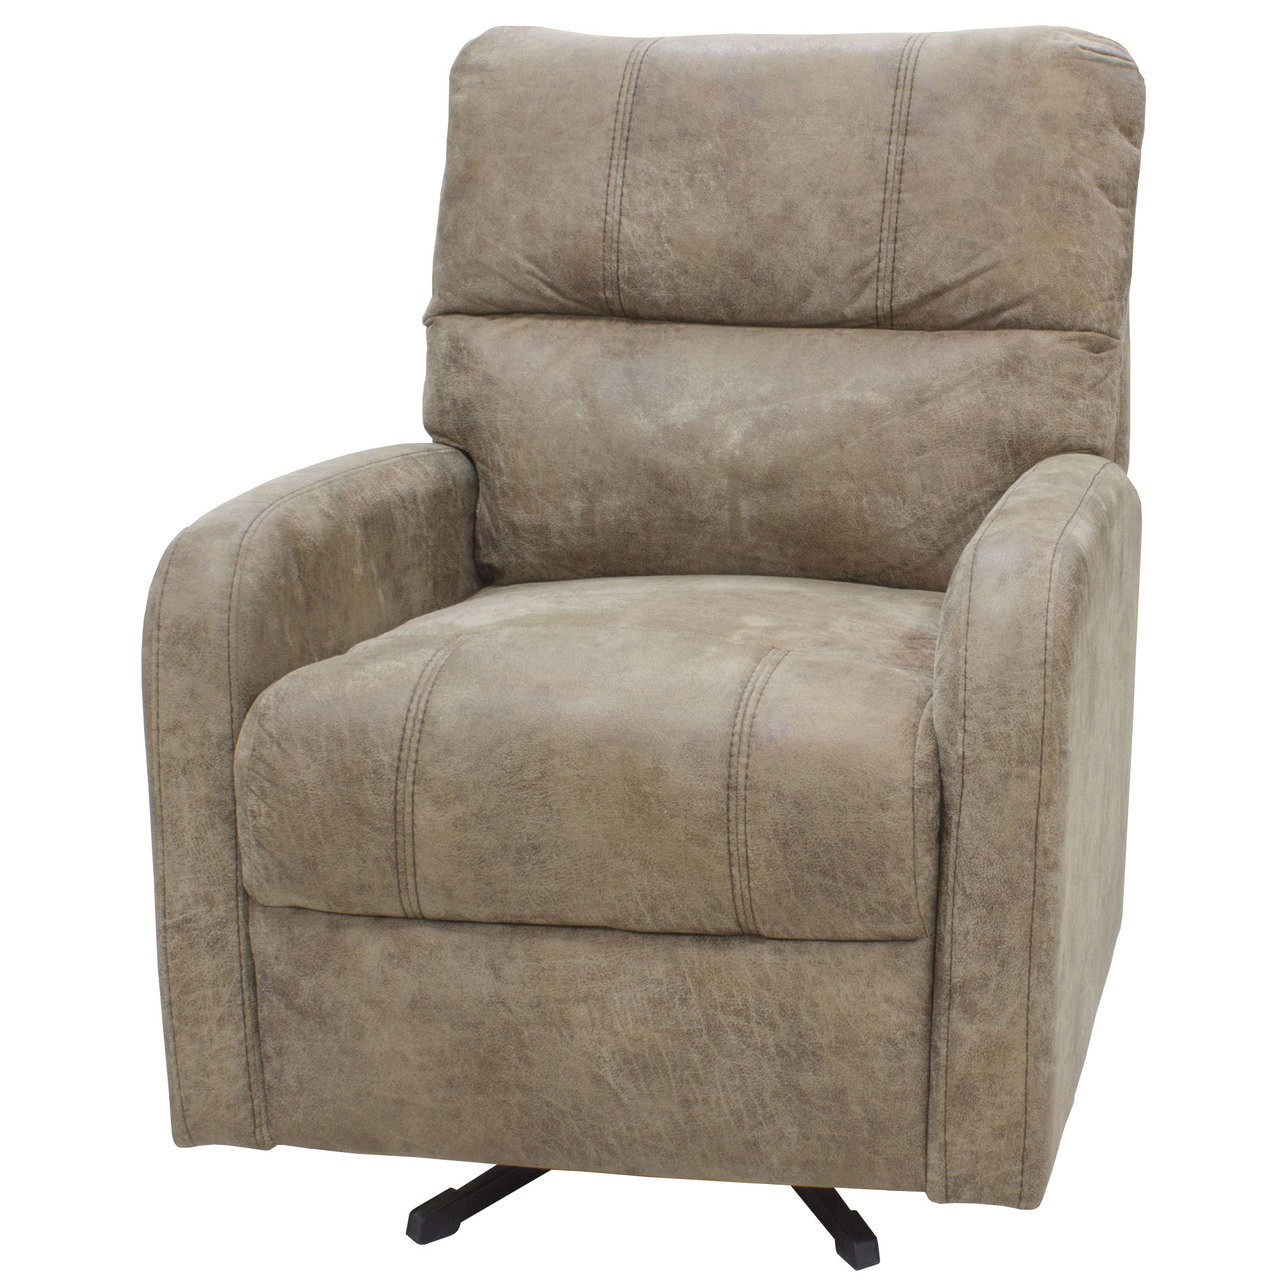 28 U0026quot  Smoked Tan Swivel Chair